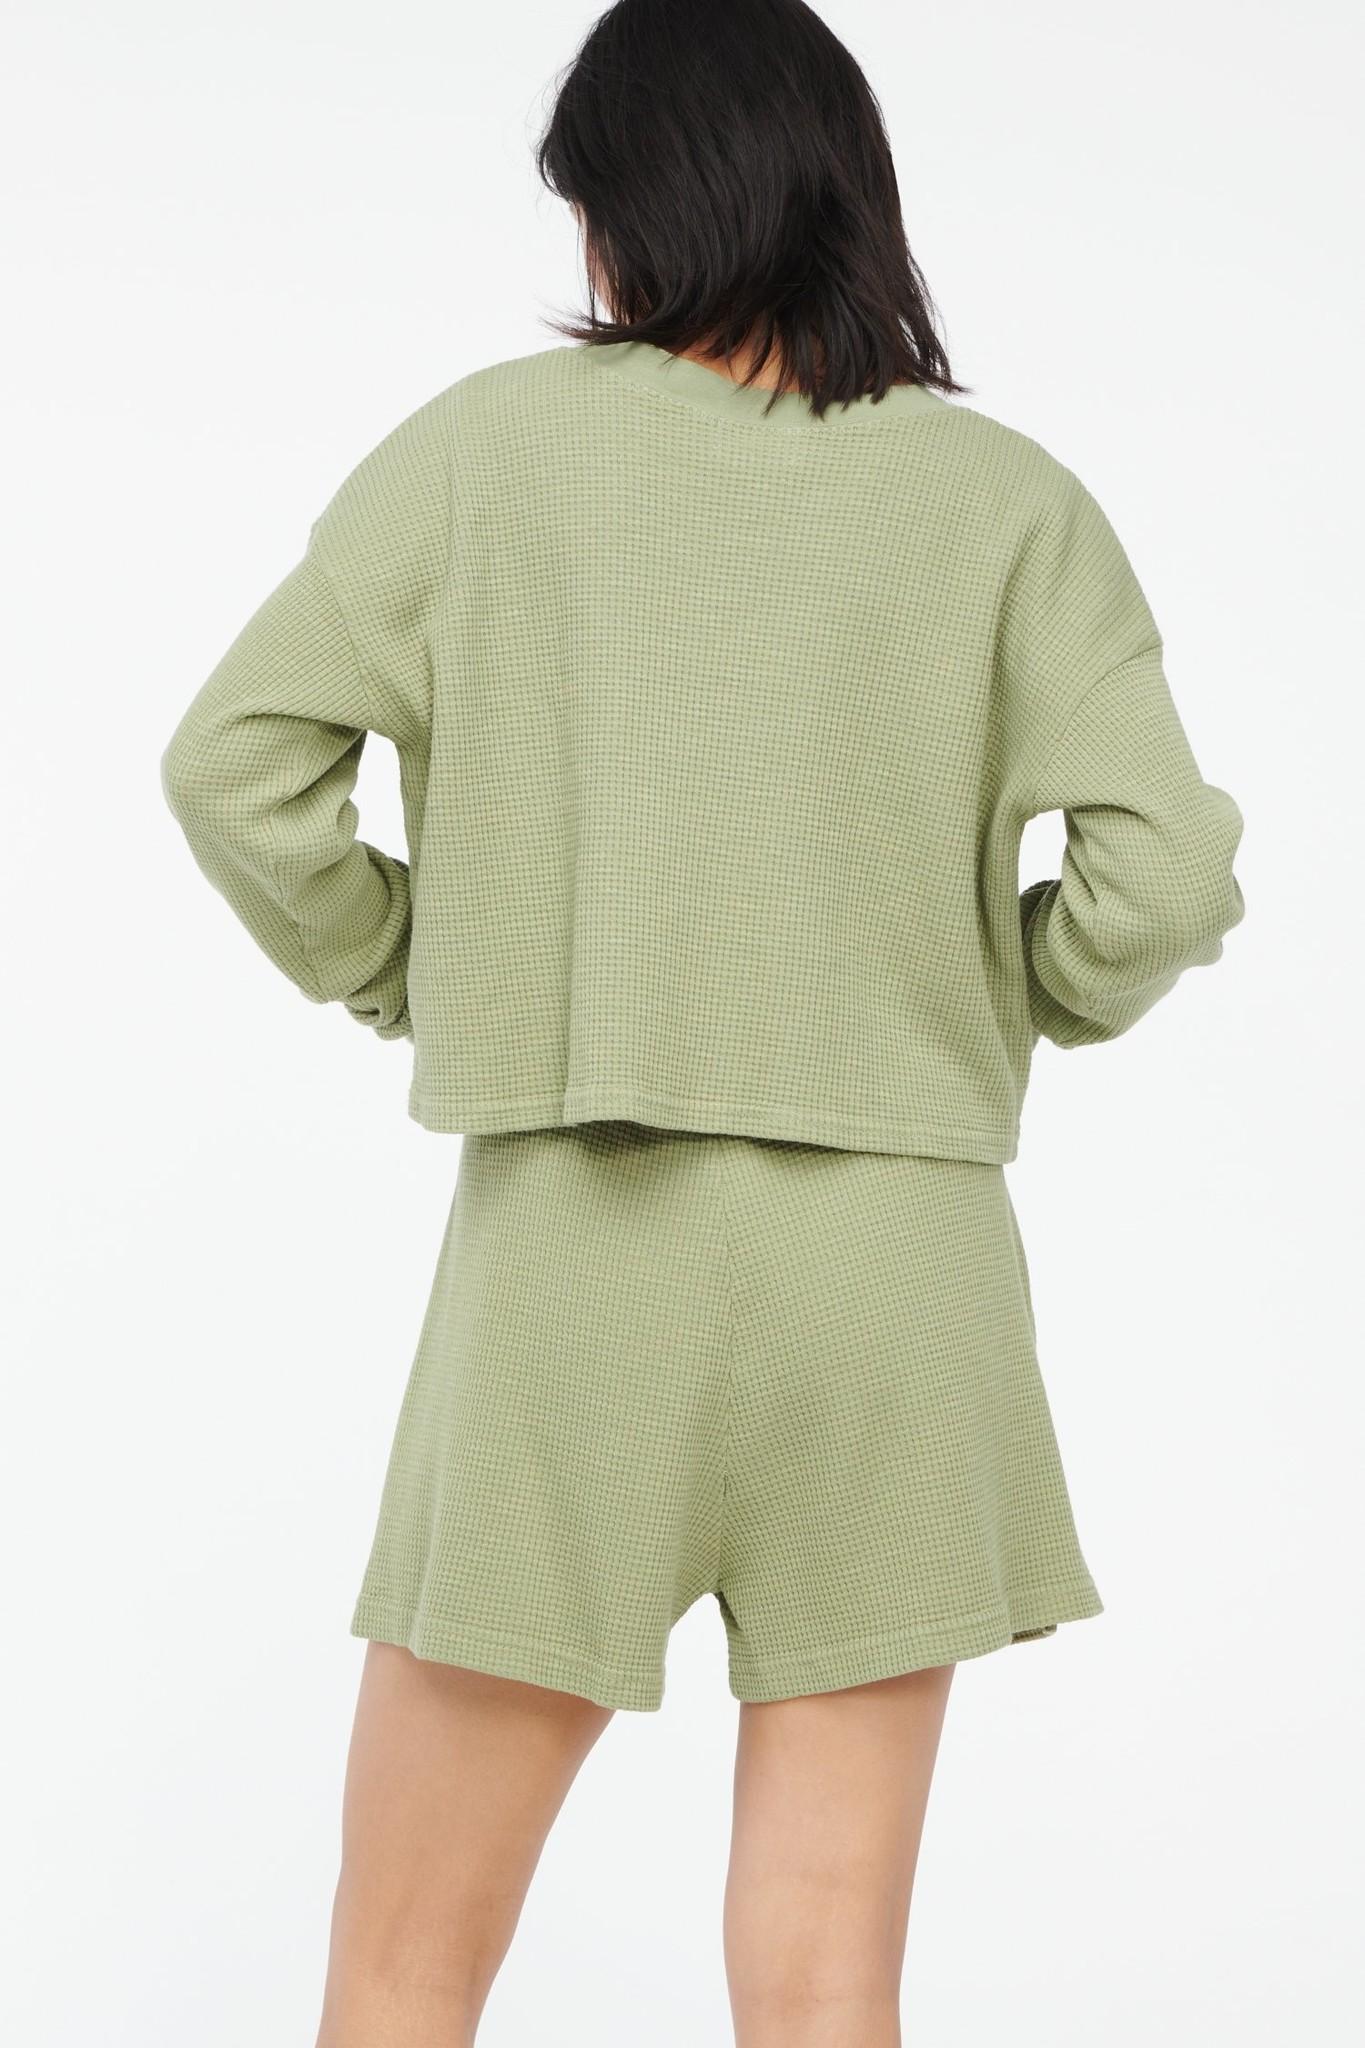 lacausa Dakota Thermal Top - Size S